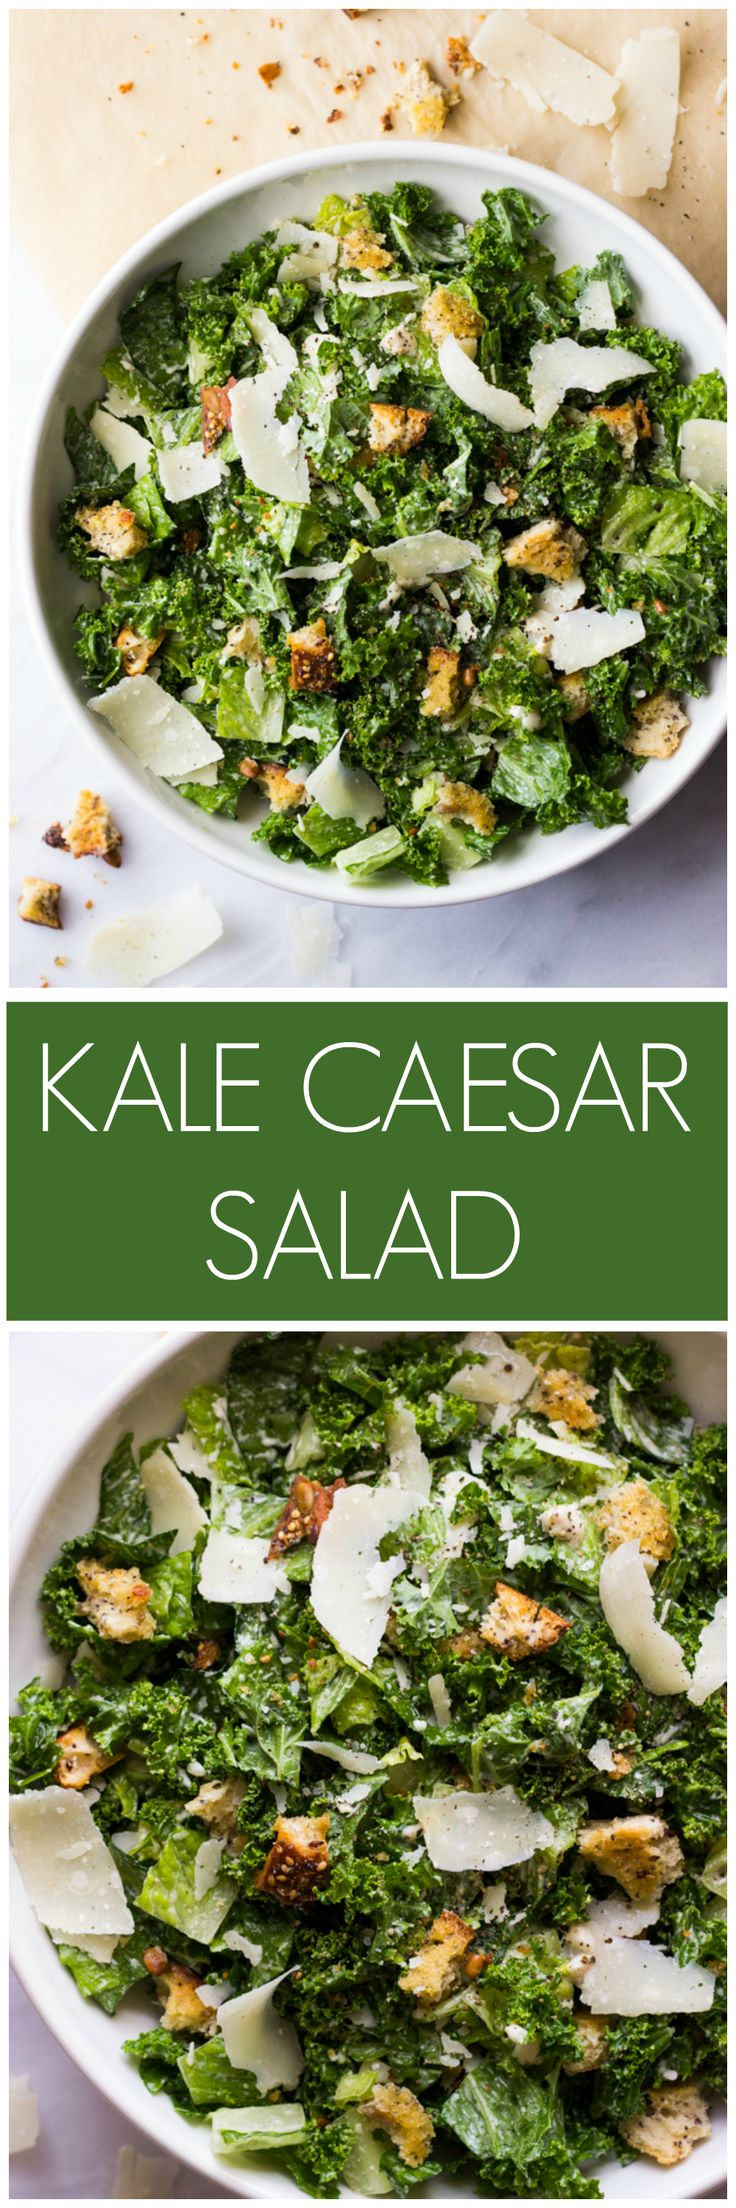 Kale Caesar Salad - nutritious kale and romaine caesar salad with greek yogurt caesar dressing | littlebroken.com @littlebroken